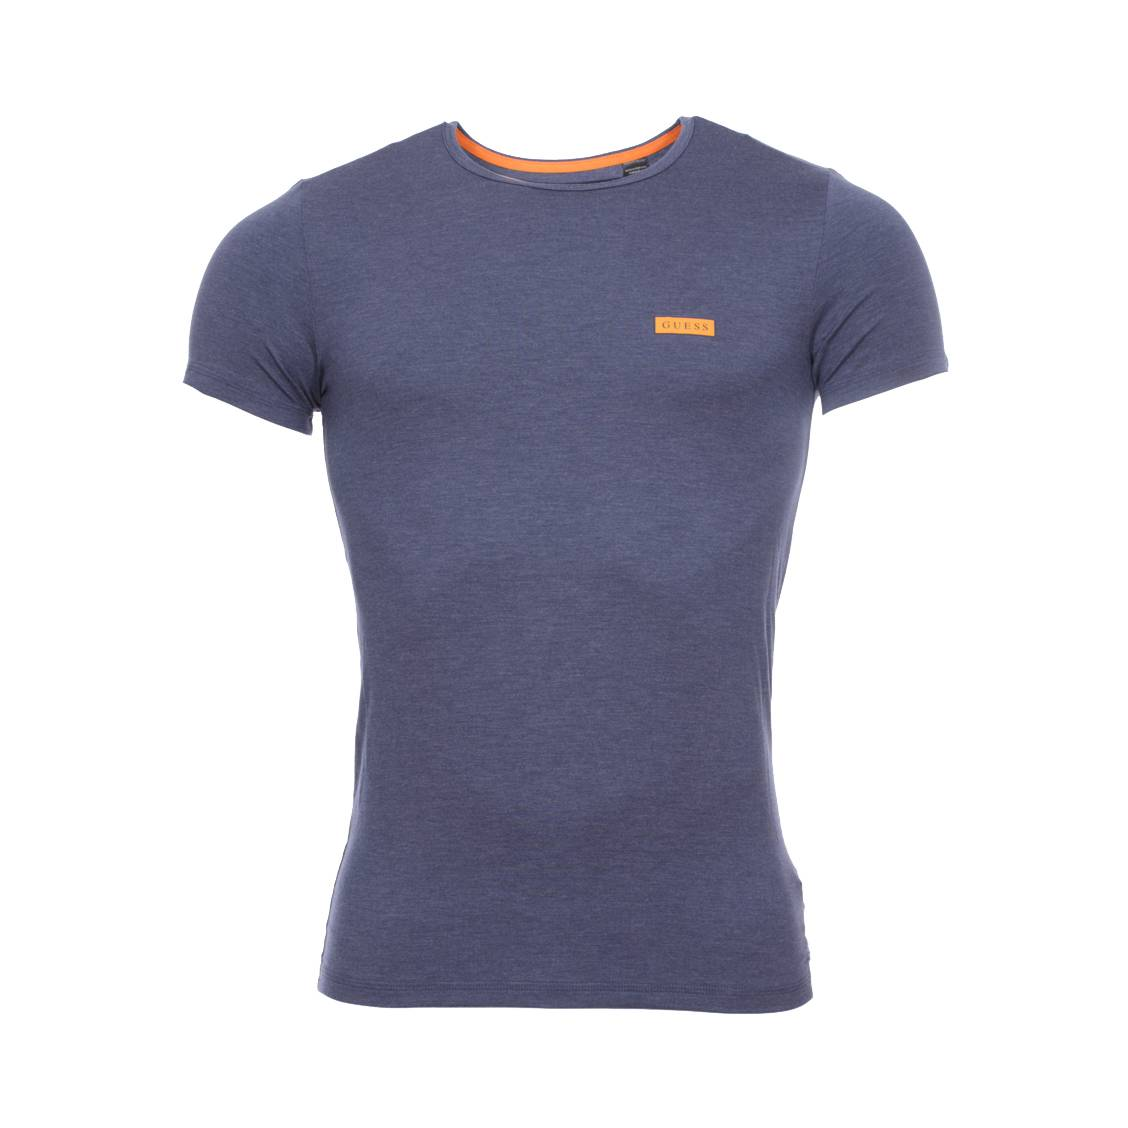 Tee-shirt col rond guess en lyocell stretch bleu pétrole chiné à logo bleu marine sur fond orange